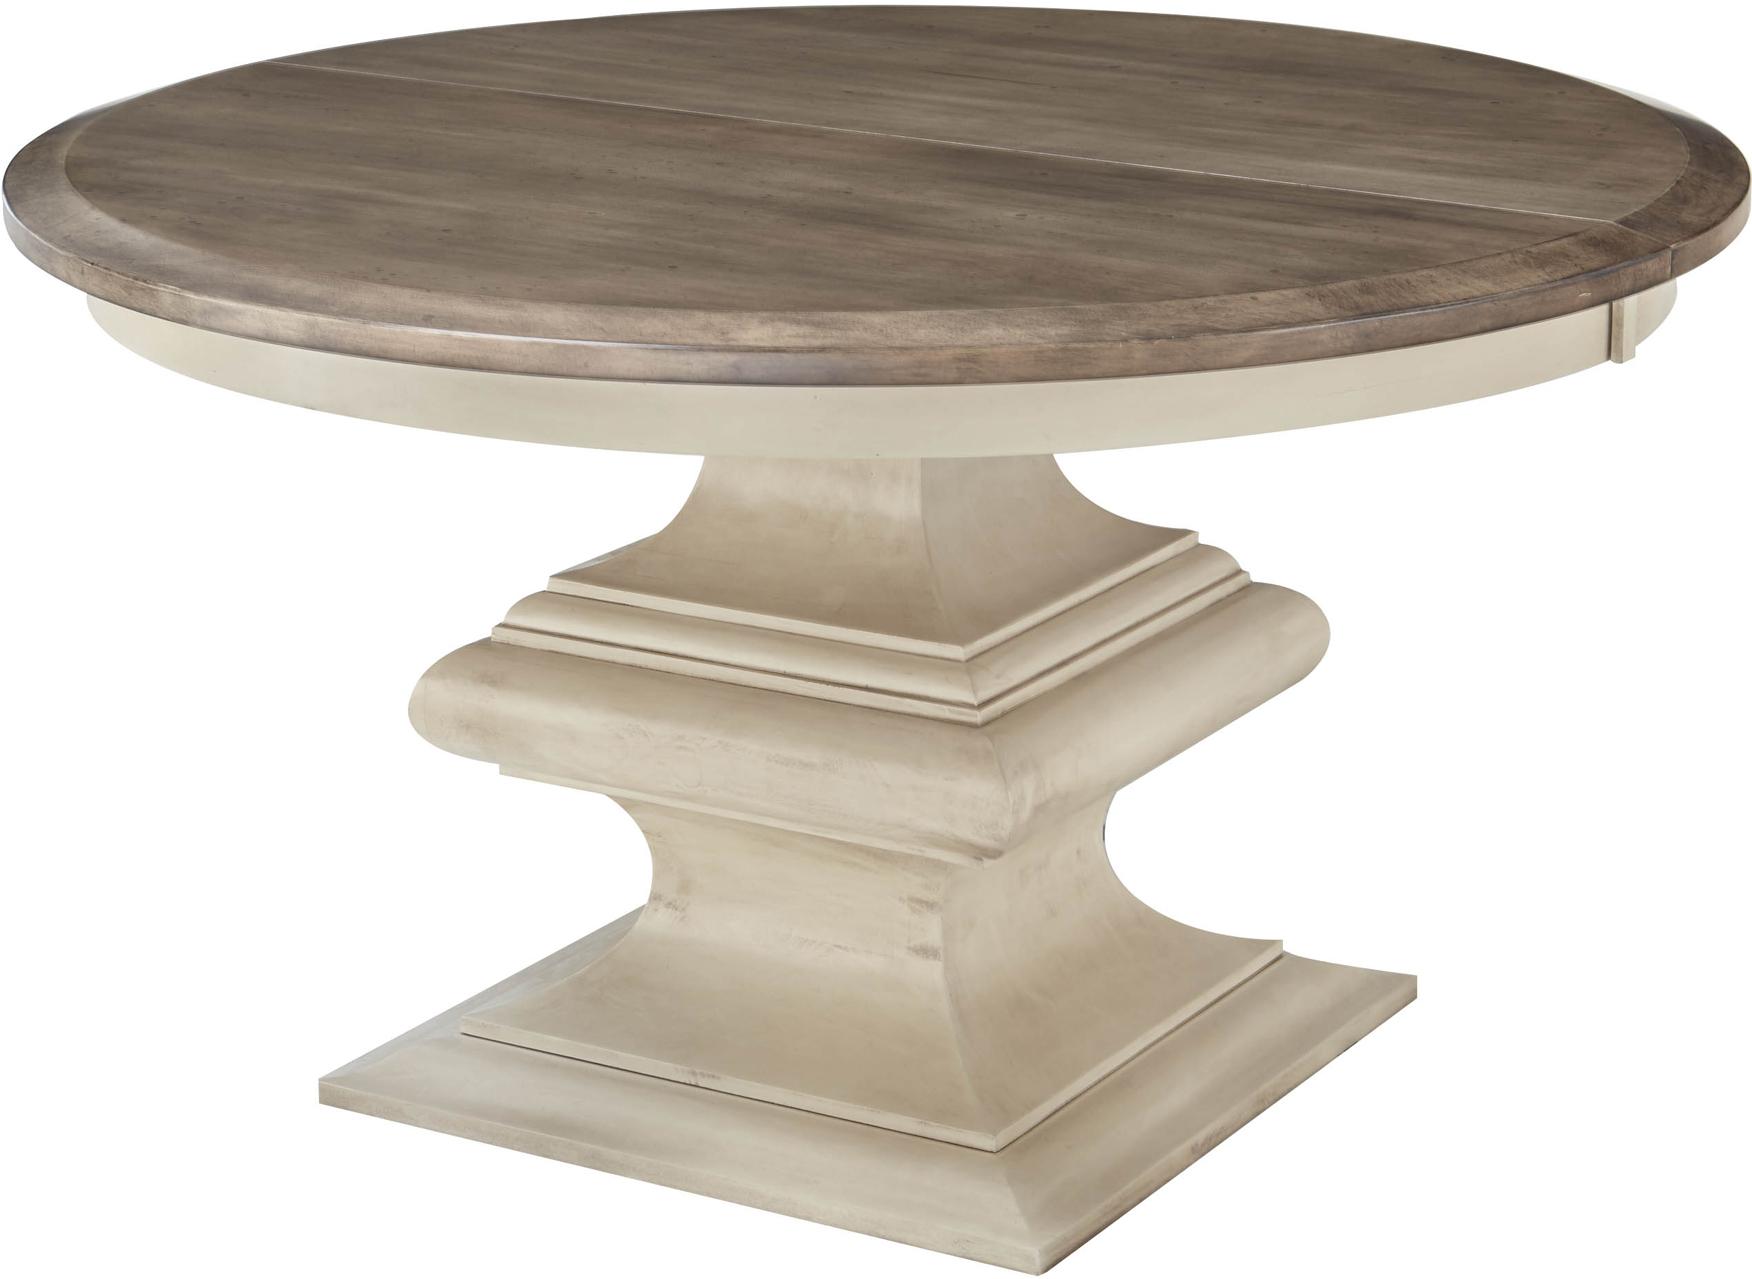 Normandy Pedestal Table